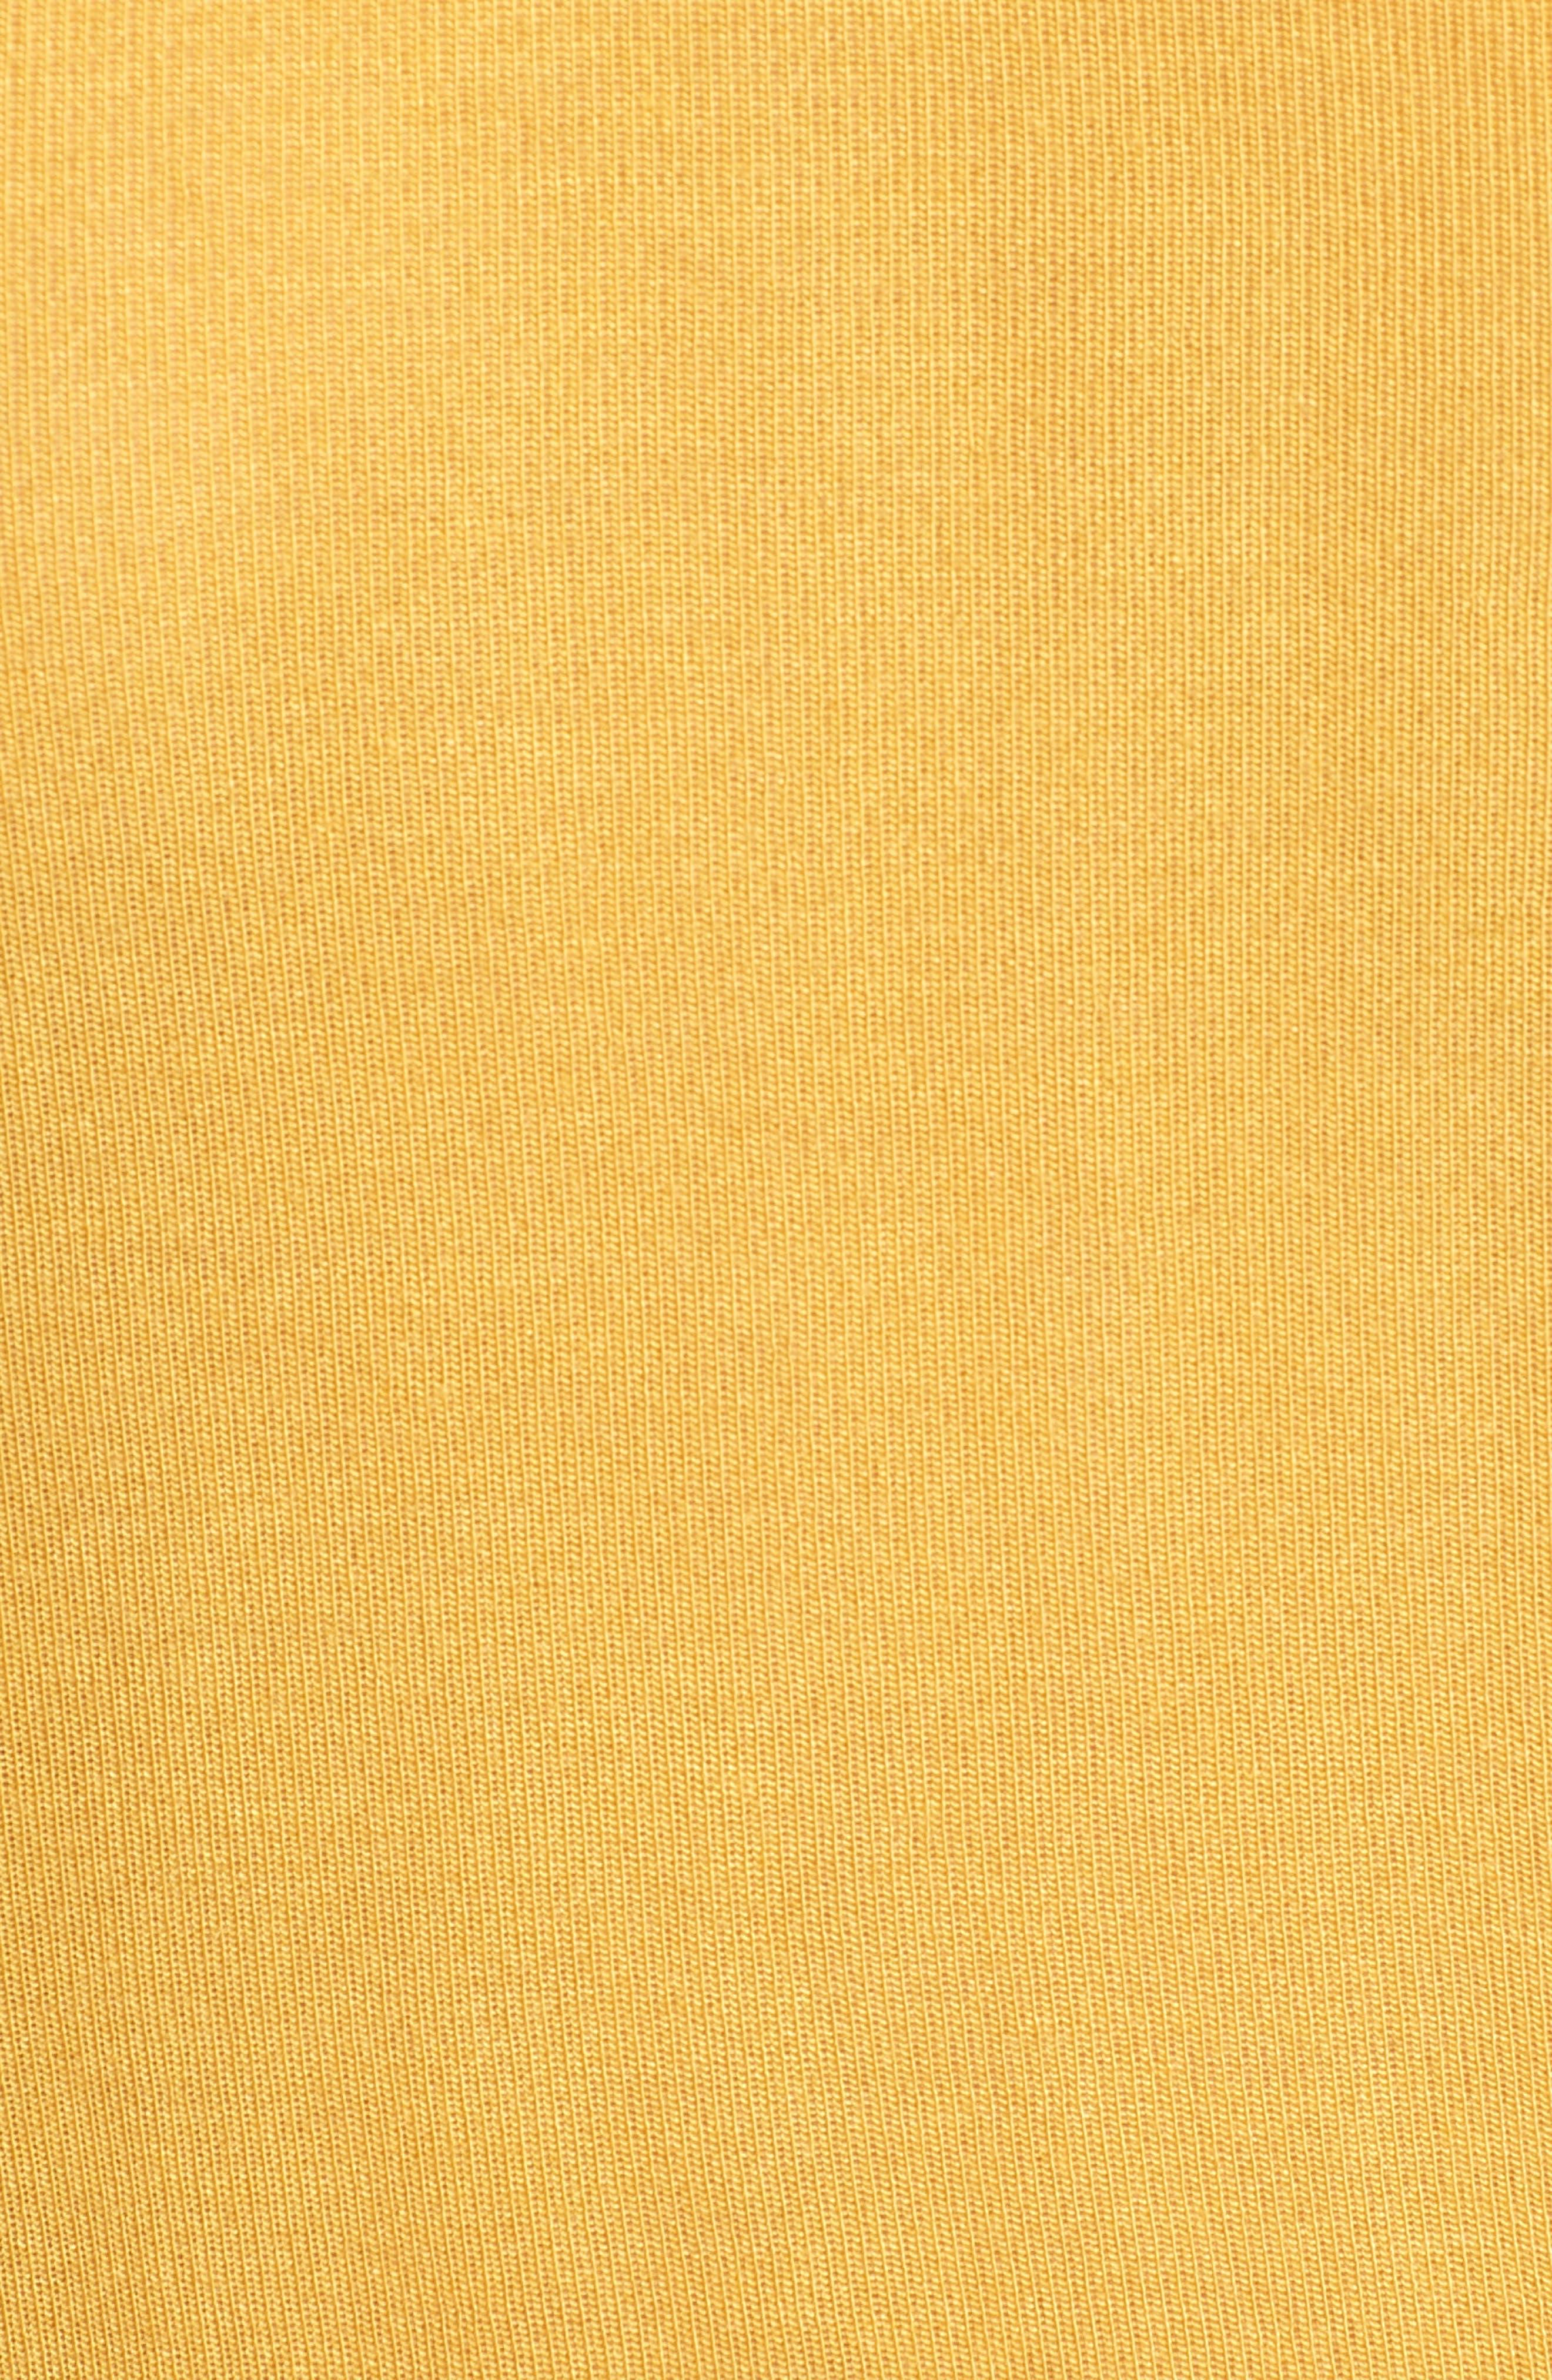 Scoop Neck Tee,                             Alternate thumbnail 6, color,                             Mustard